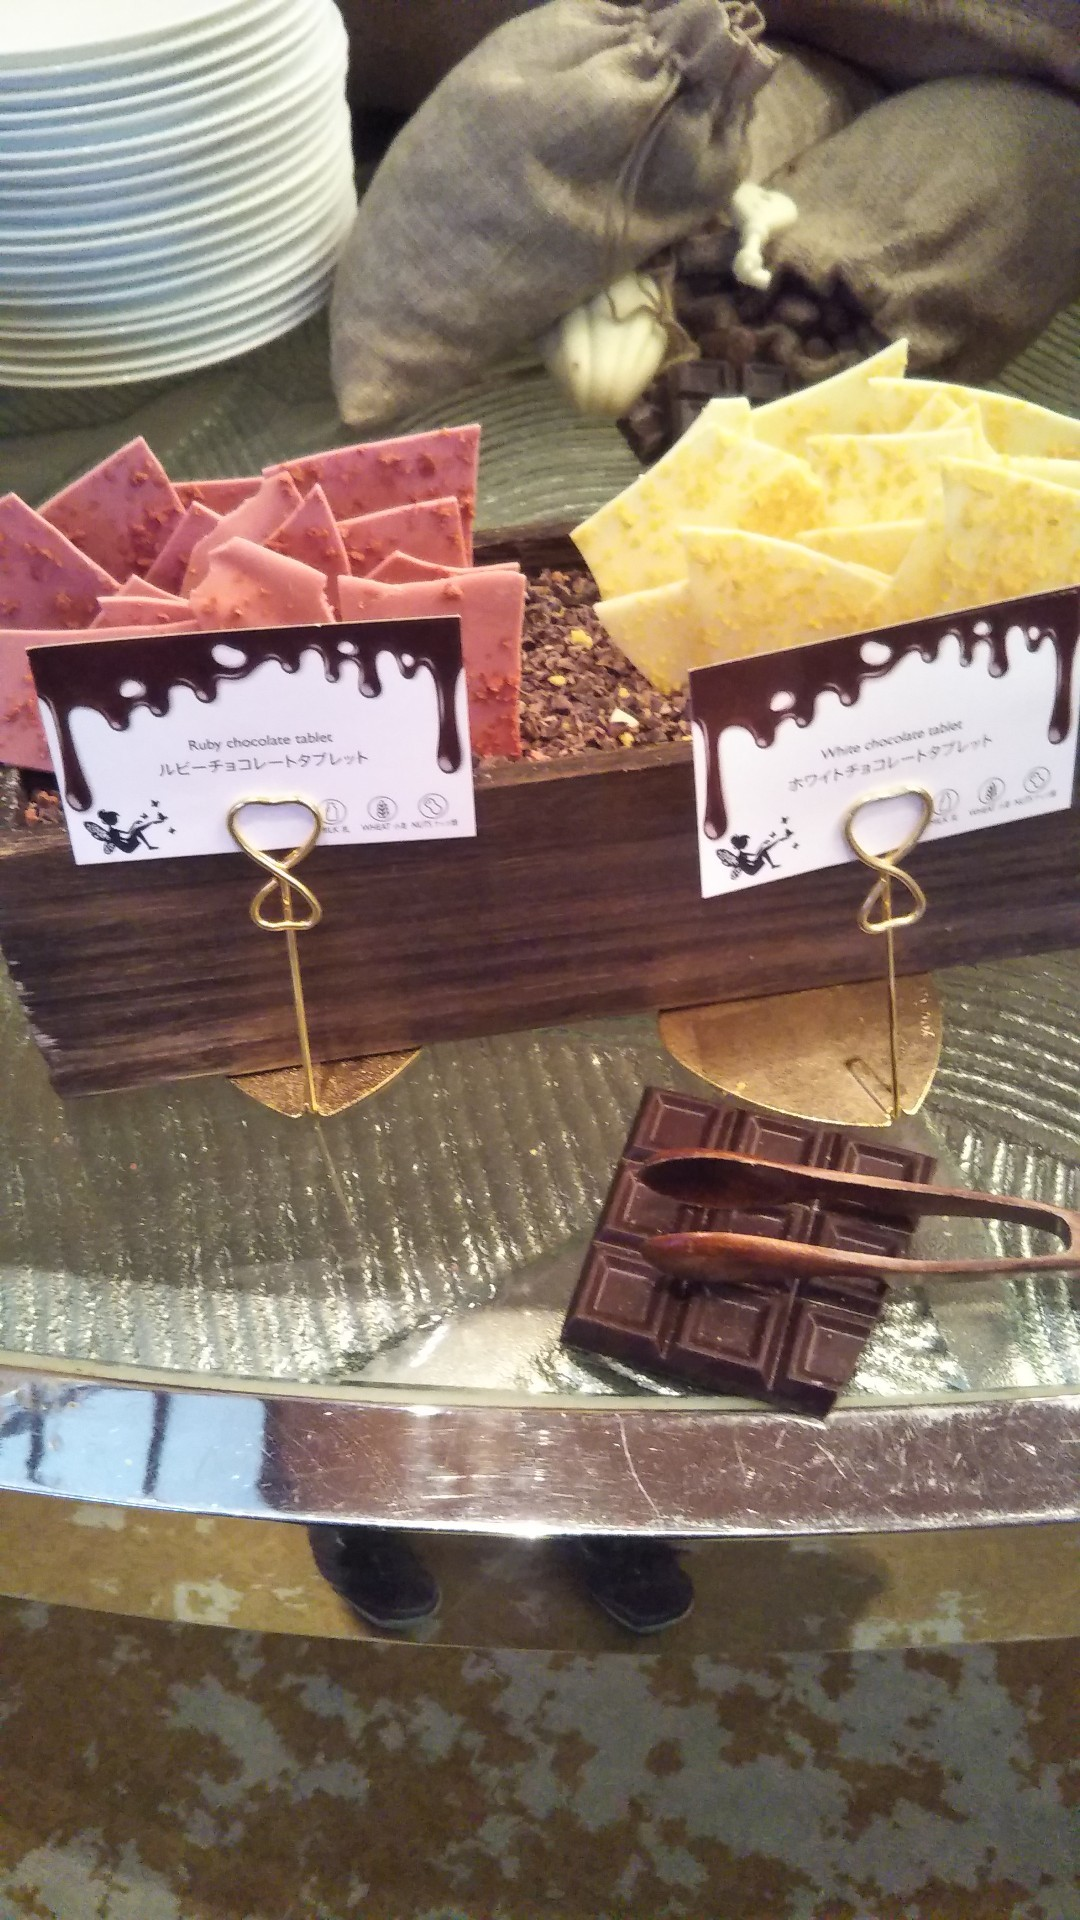 ANAインターコンチネンタルホテル東京 シャンパン・バー チョコレート・スイーツブッフェ_f0076001_21581737.jpg